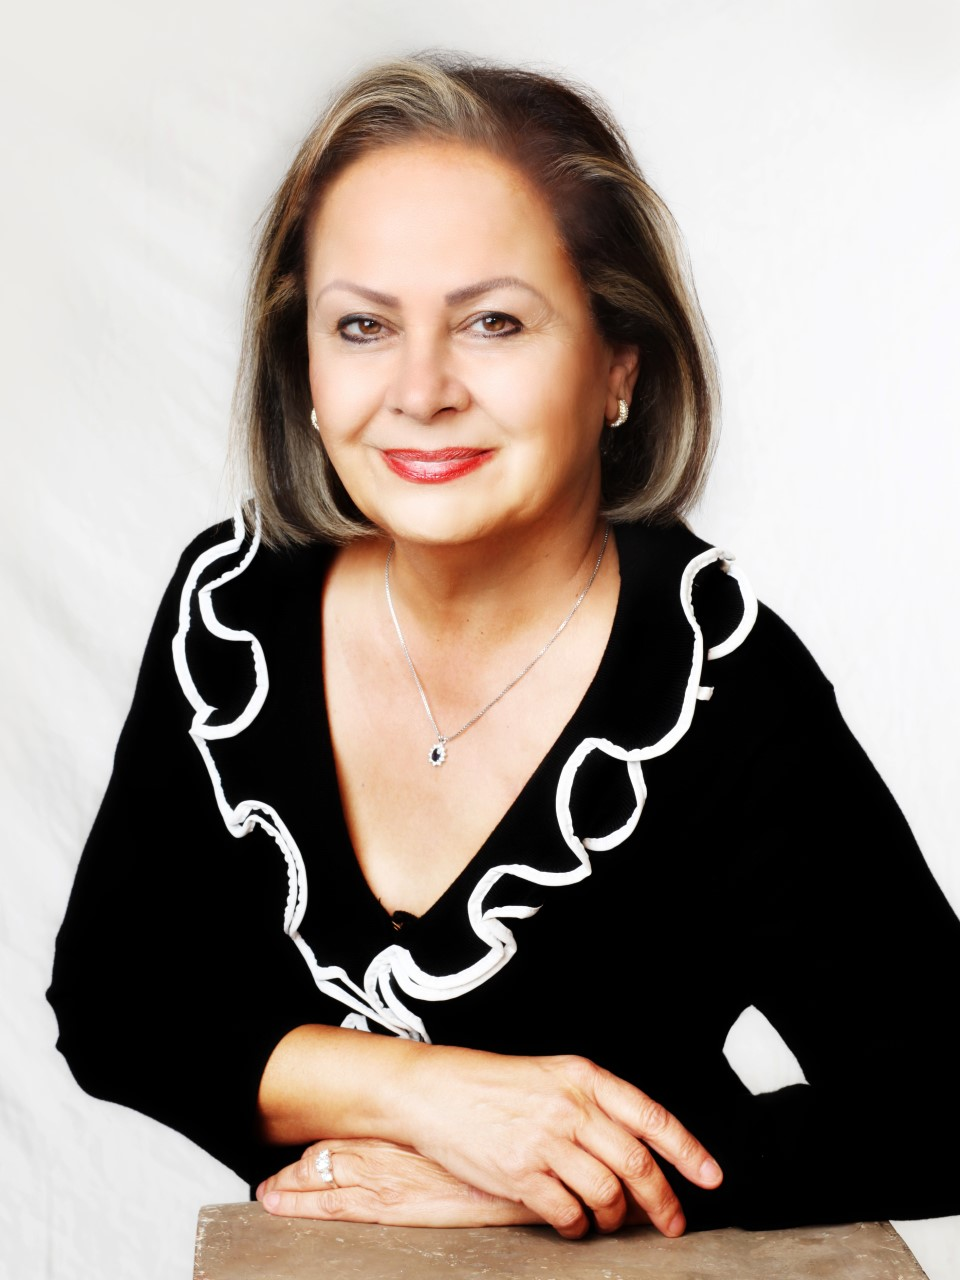 Mimi Ghofranian